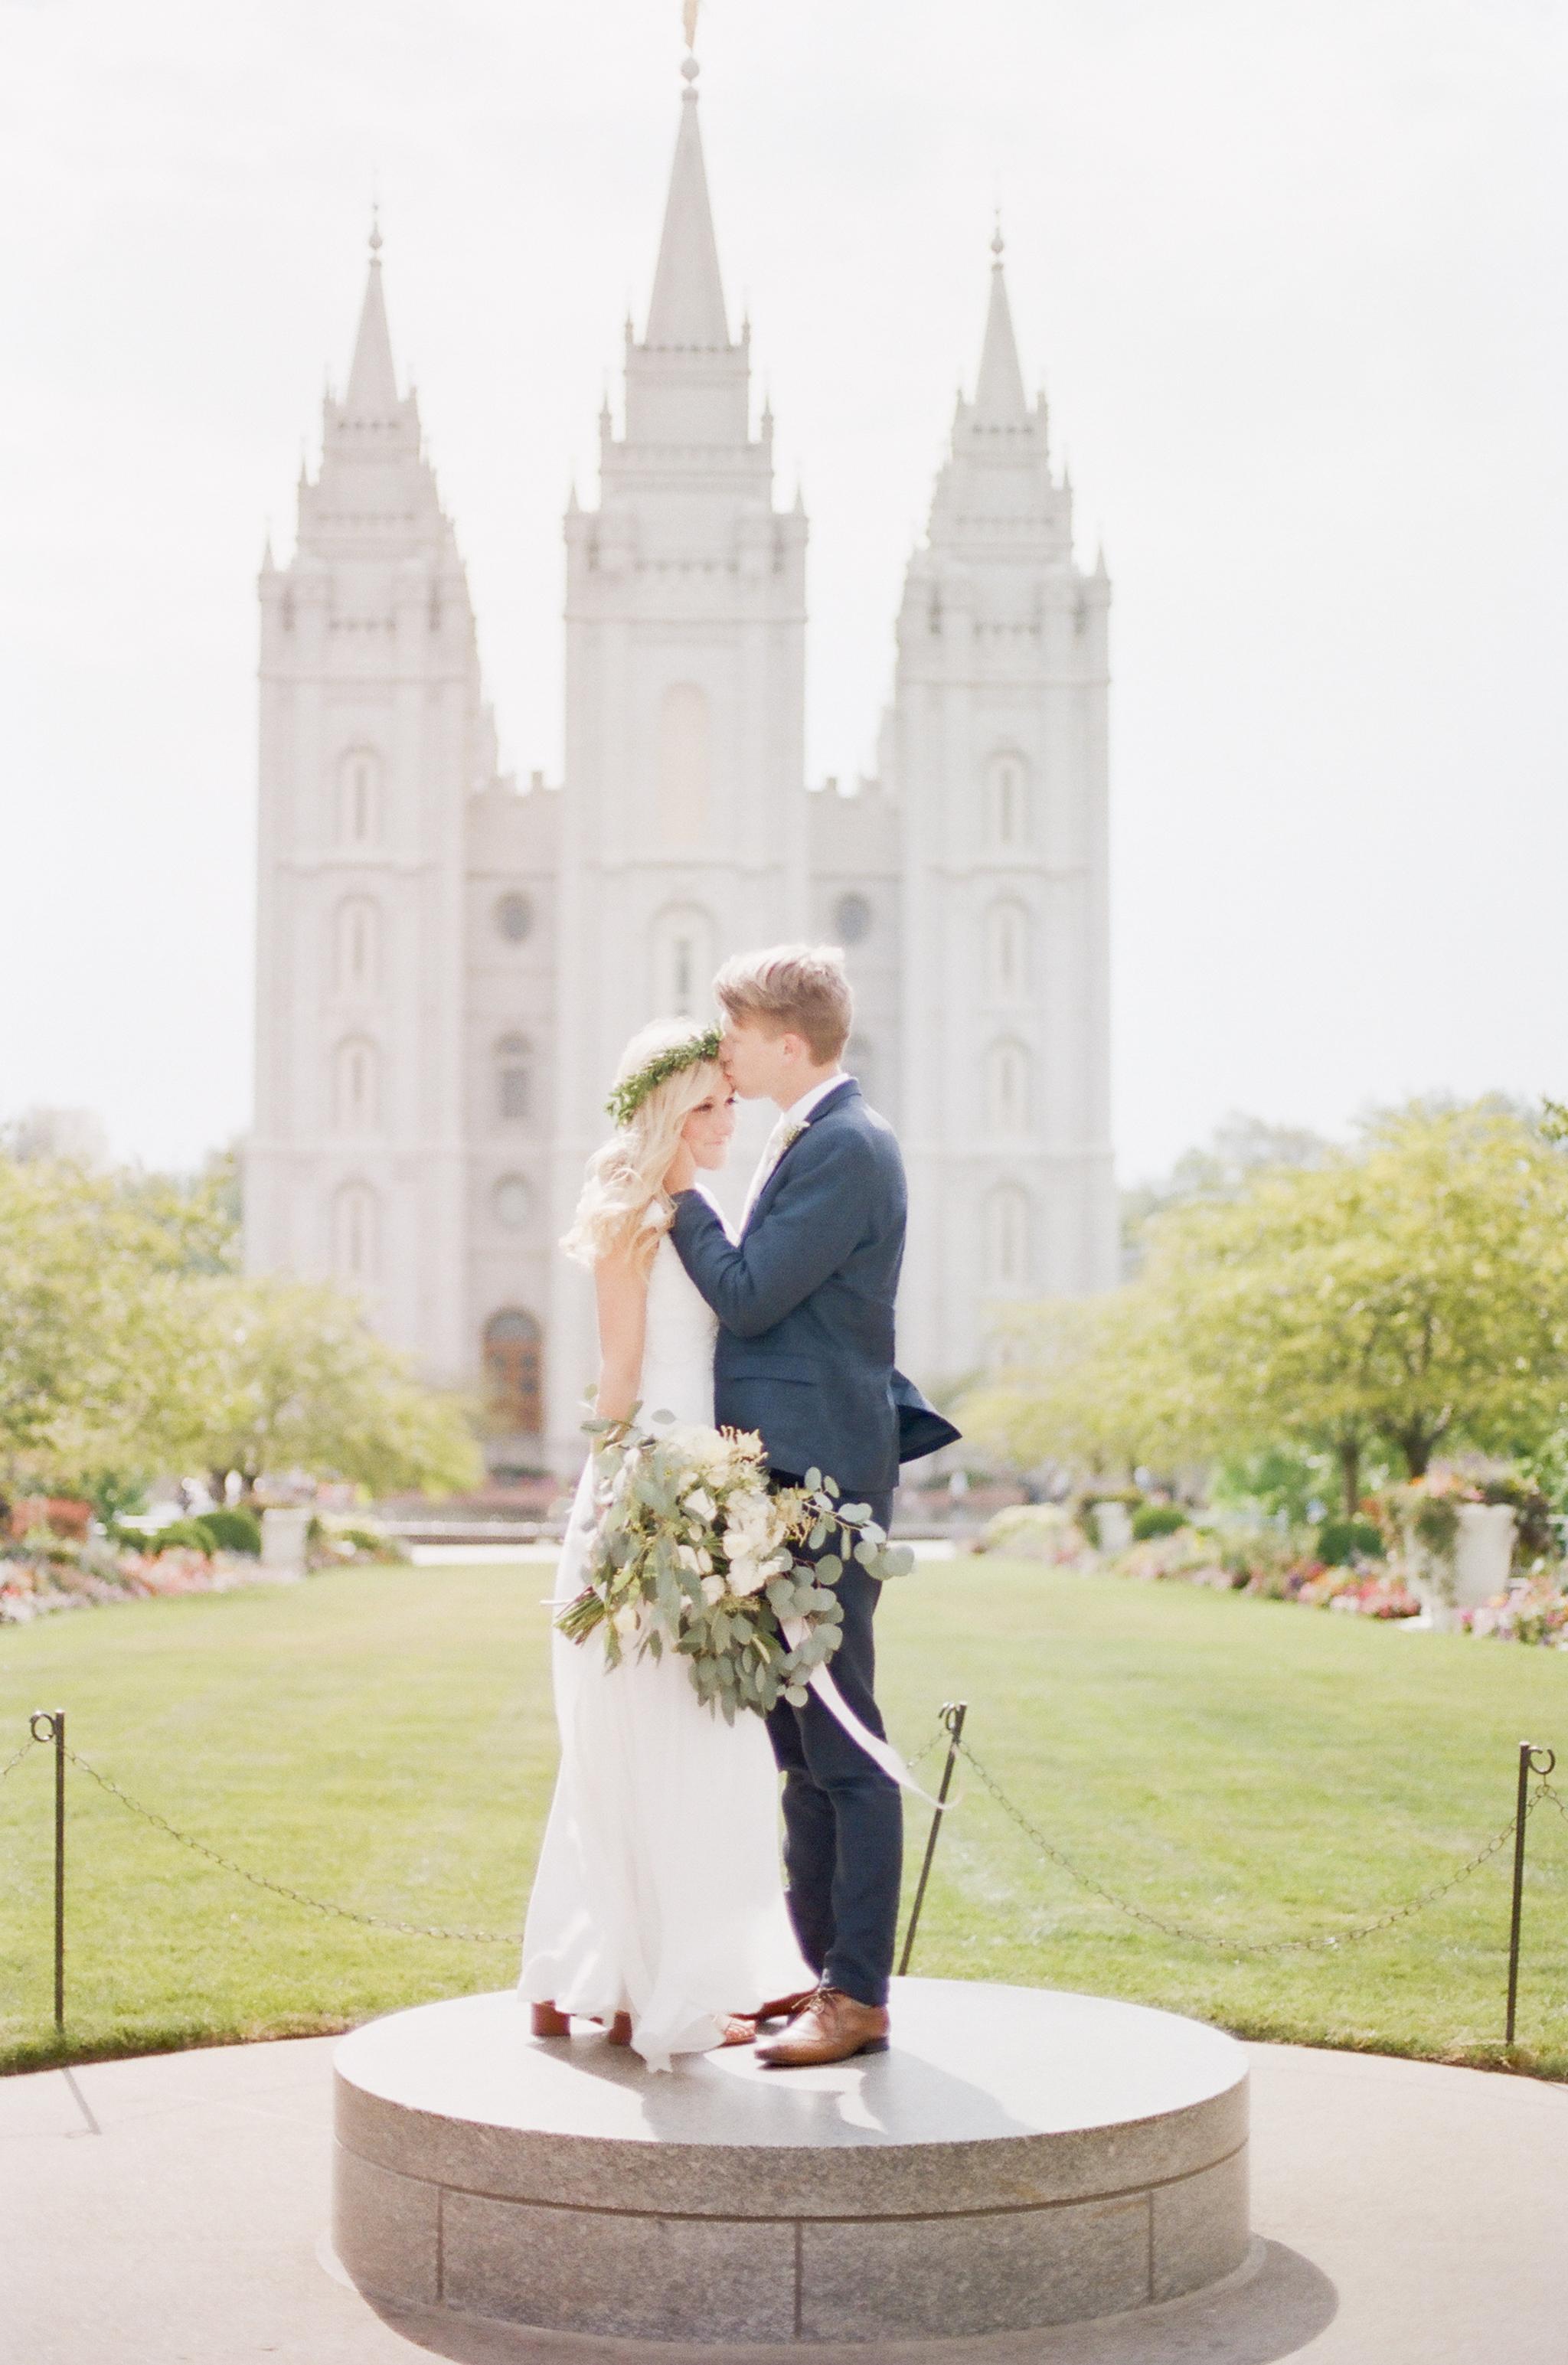 Wynona Benson Photography - Jaleisa & Logan Romantic Elegant Utah Wedding00056.jpg